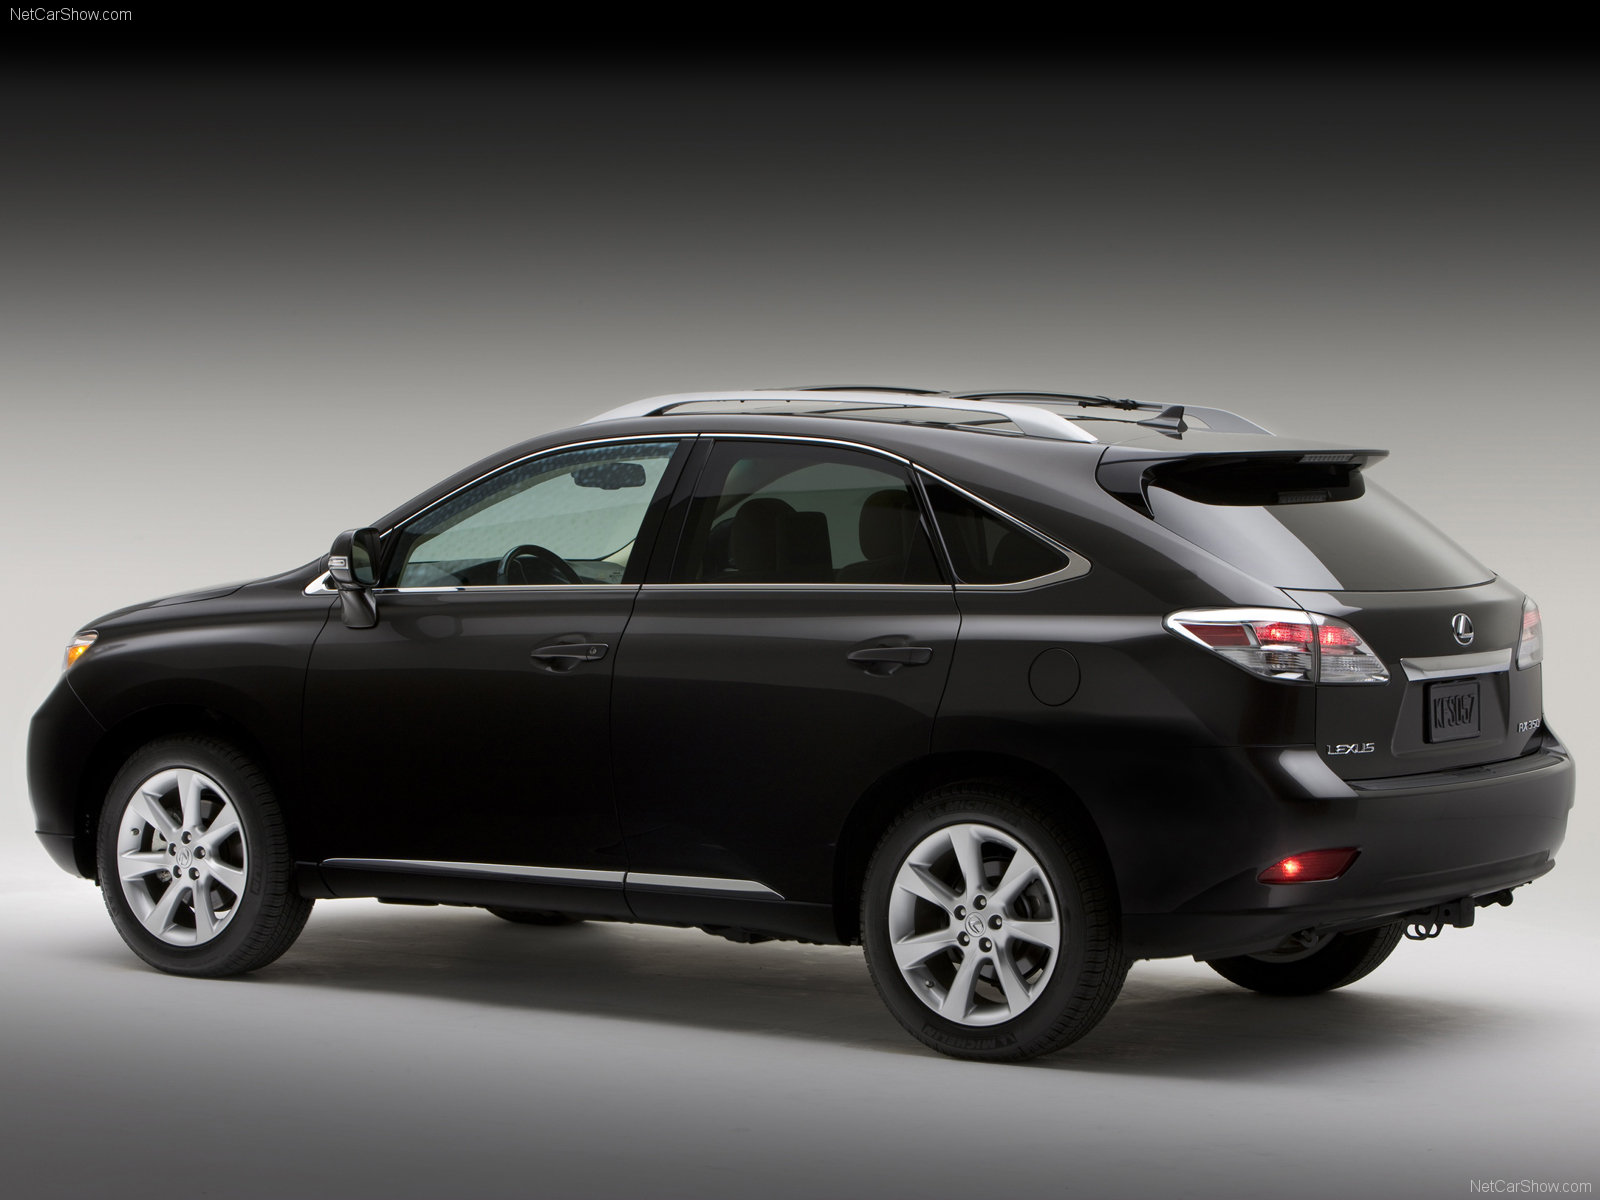 Lexus-RX_350_mp30_pic_59772.jpg